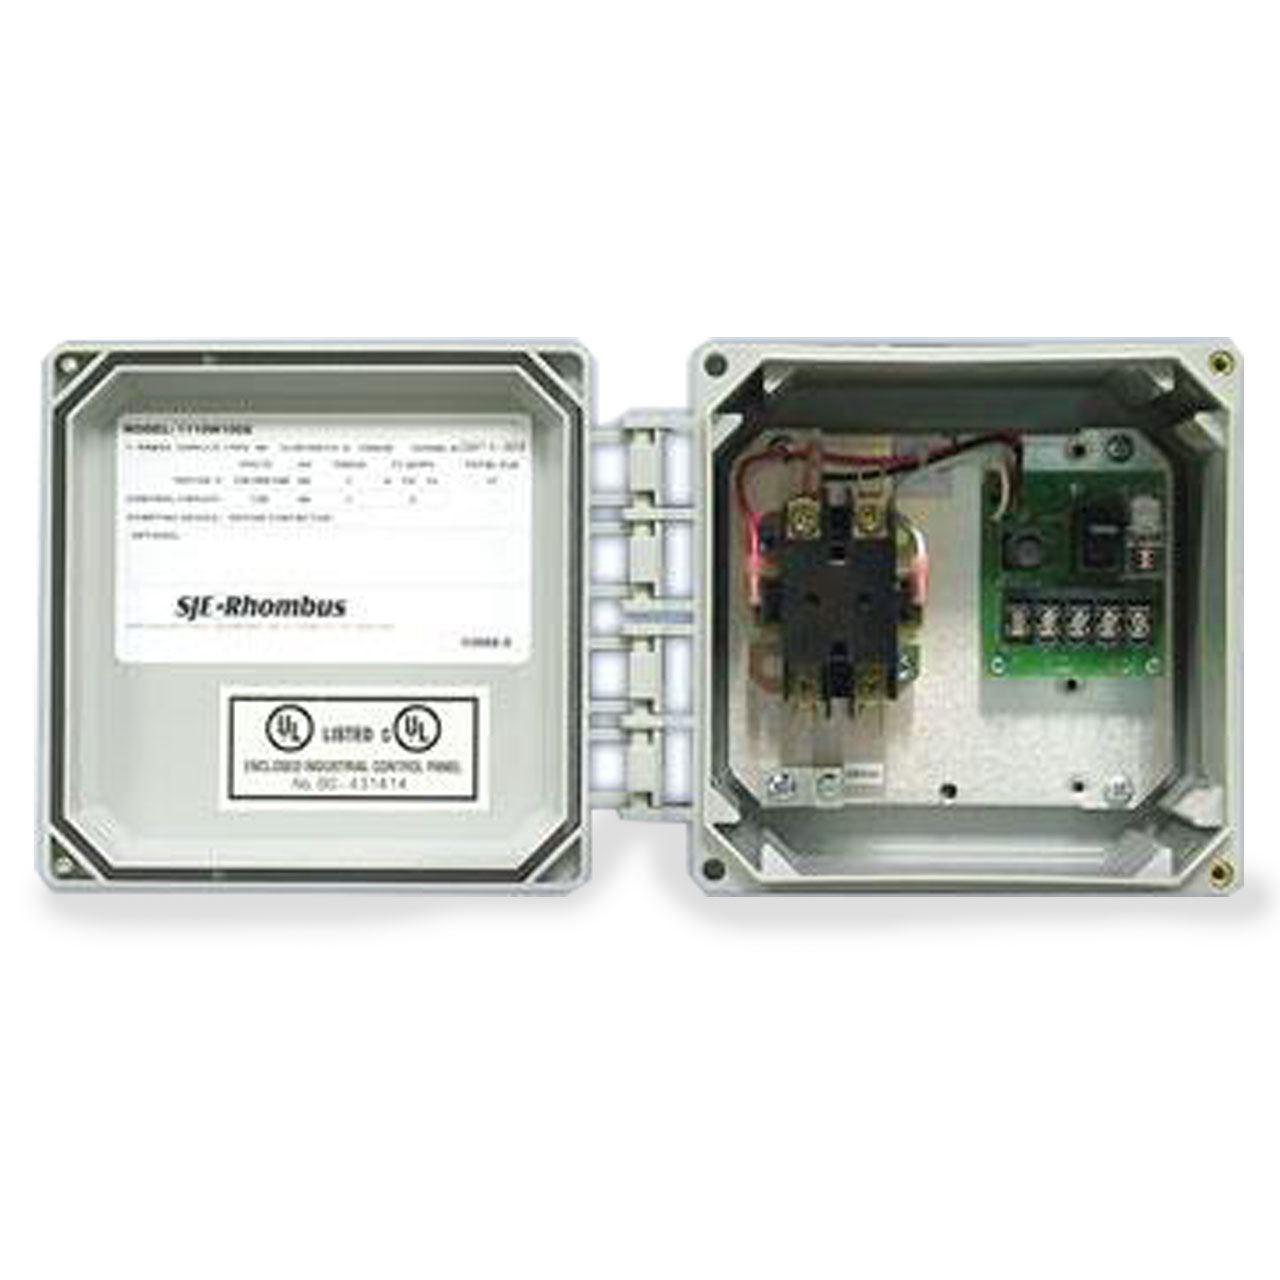 panel111_WBG simplex float wiring diagram turcolea com simplex 4020 wiring diagram at edmiracle.co